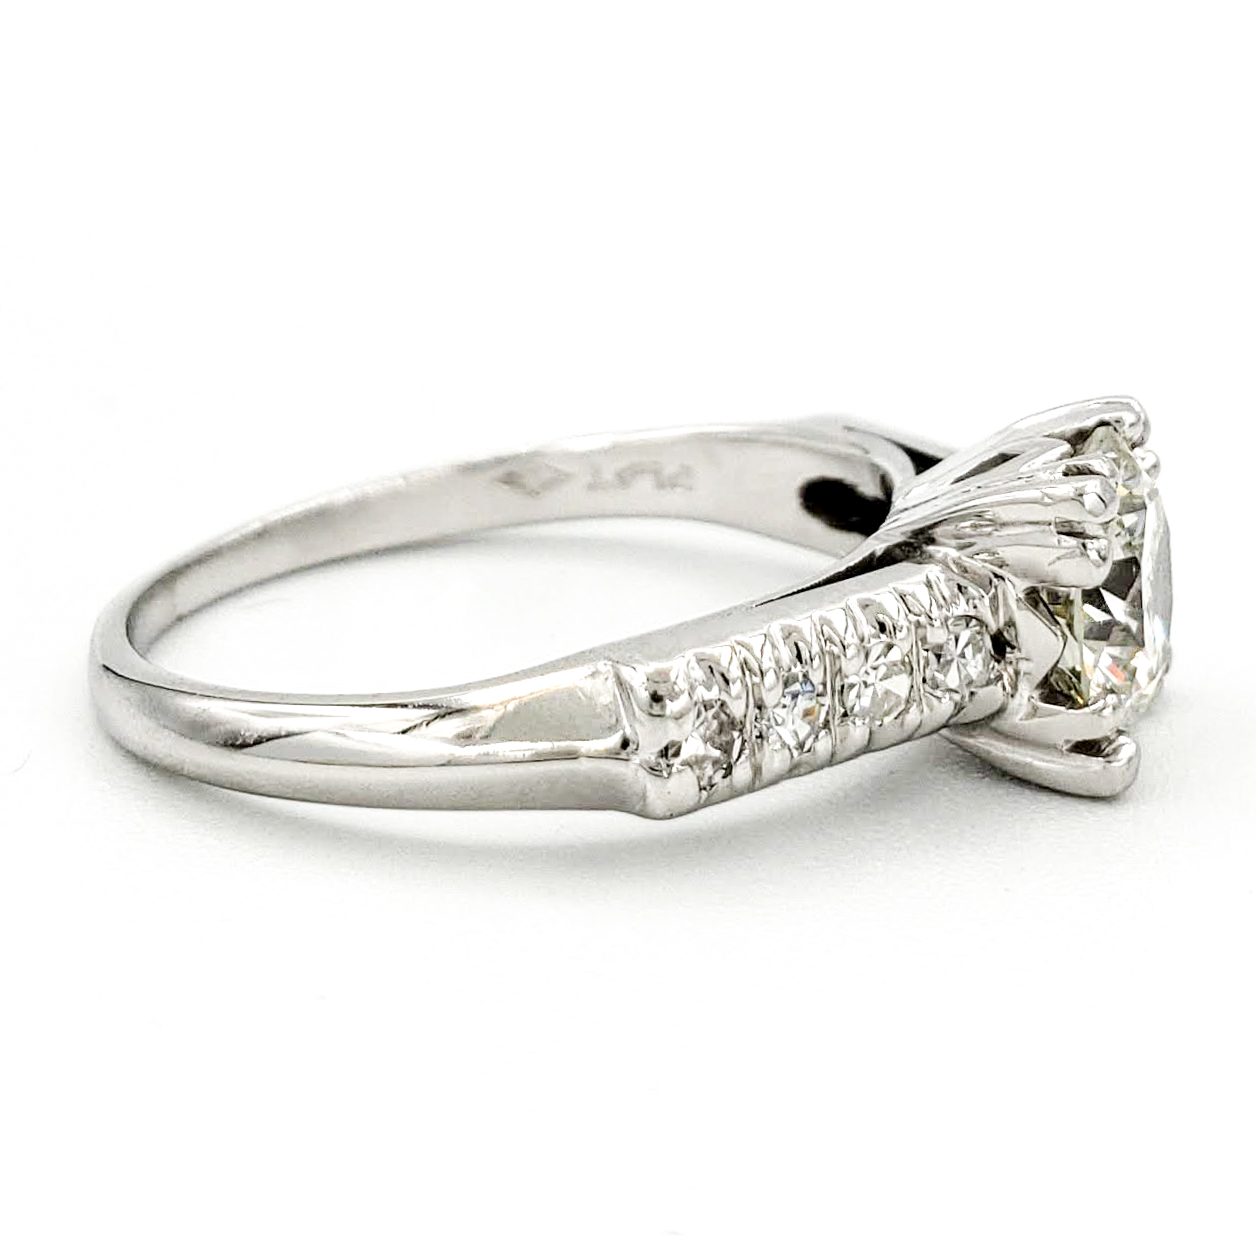 vintage-platinum-engagement-ring-with-0-81-carat-round-brilliant-cut-diamond-egl-j-s11